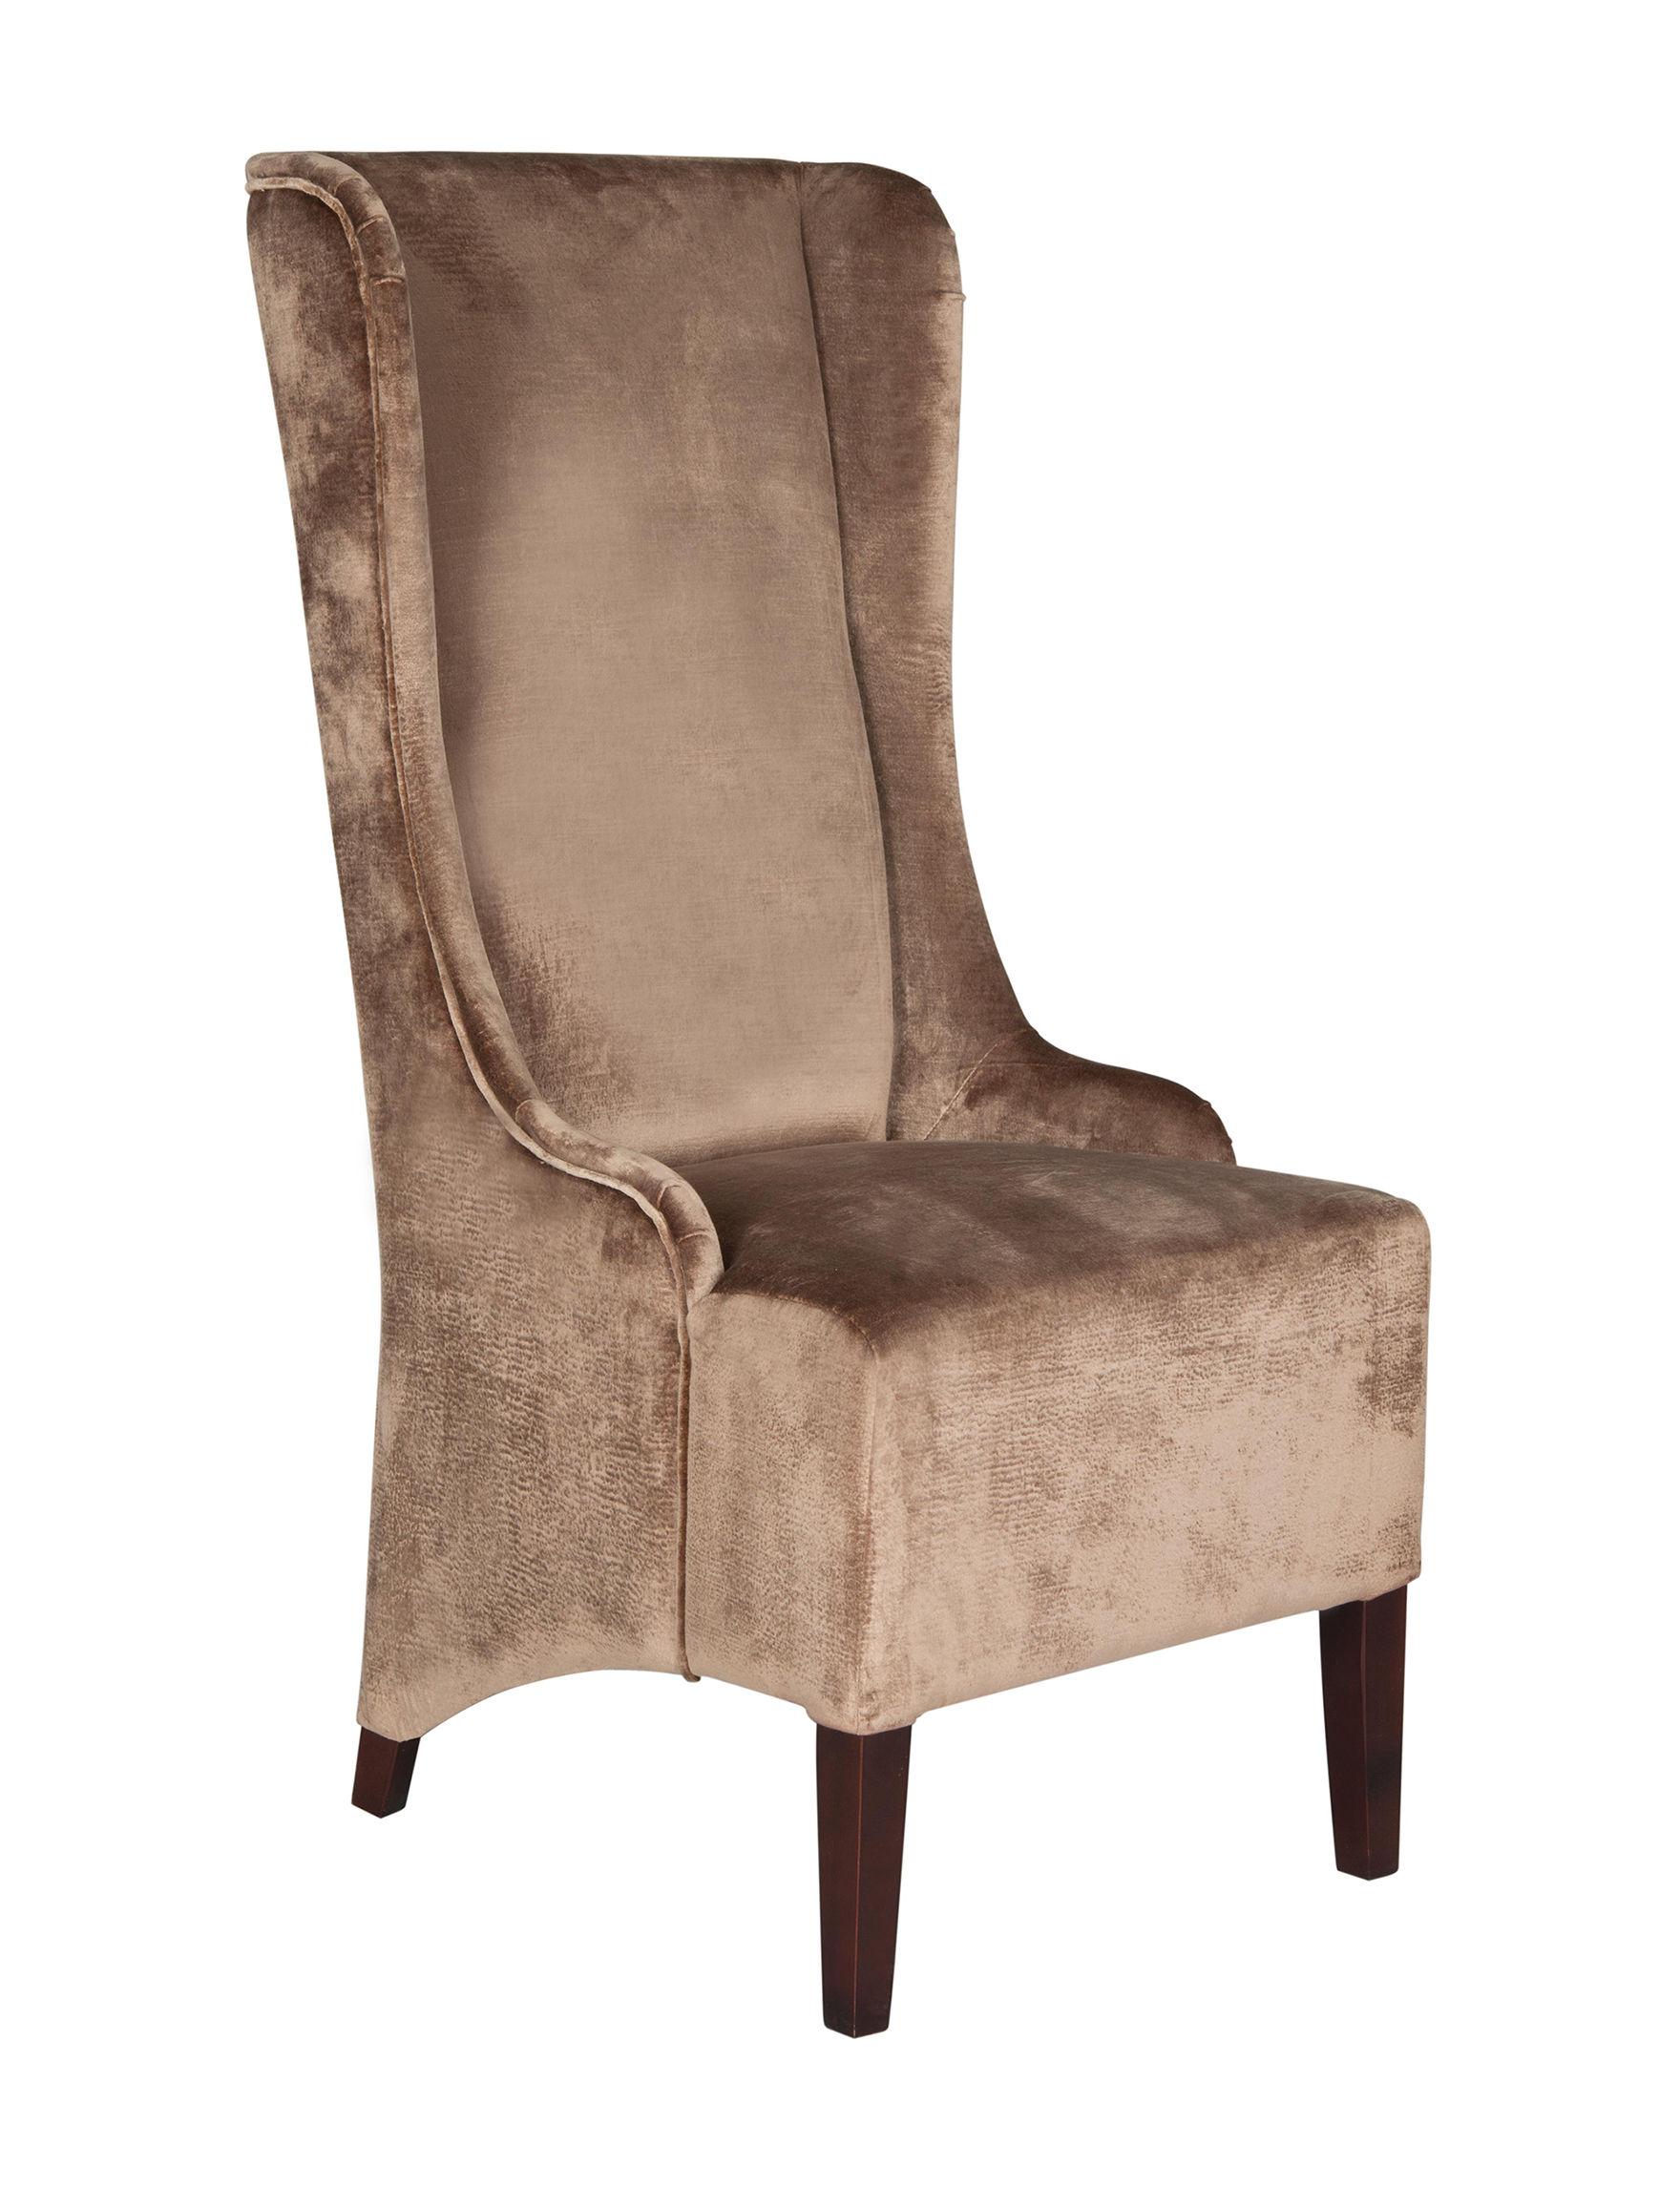 Safavieh Bark Brown/Black Dining Chairs Kitchen & Dining Furniture